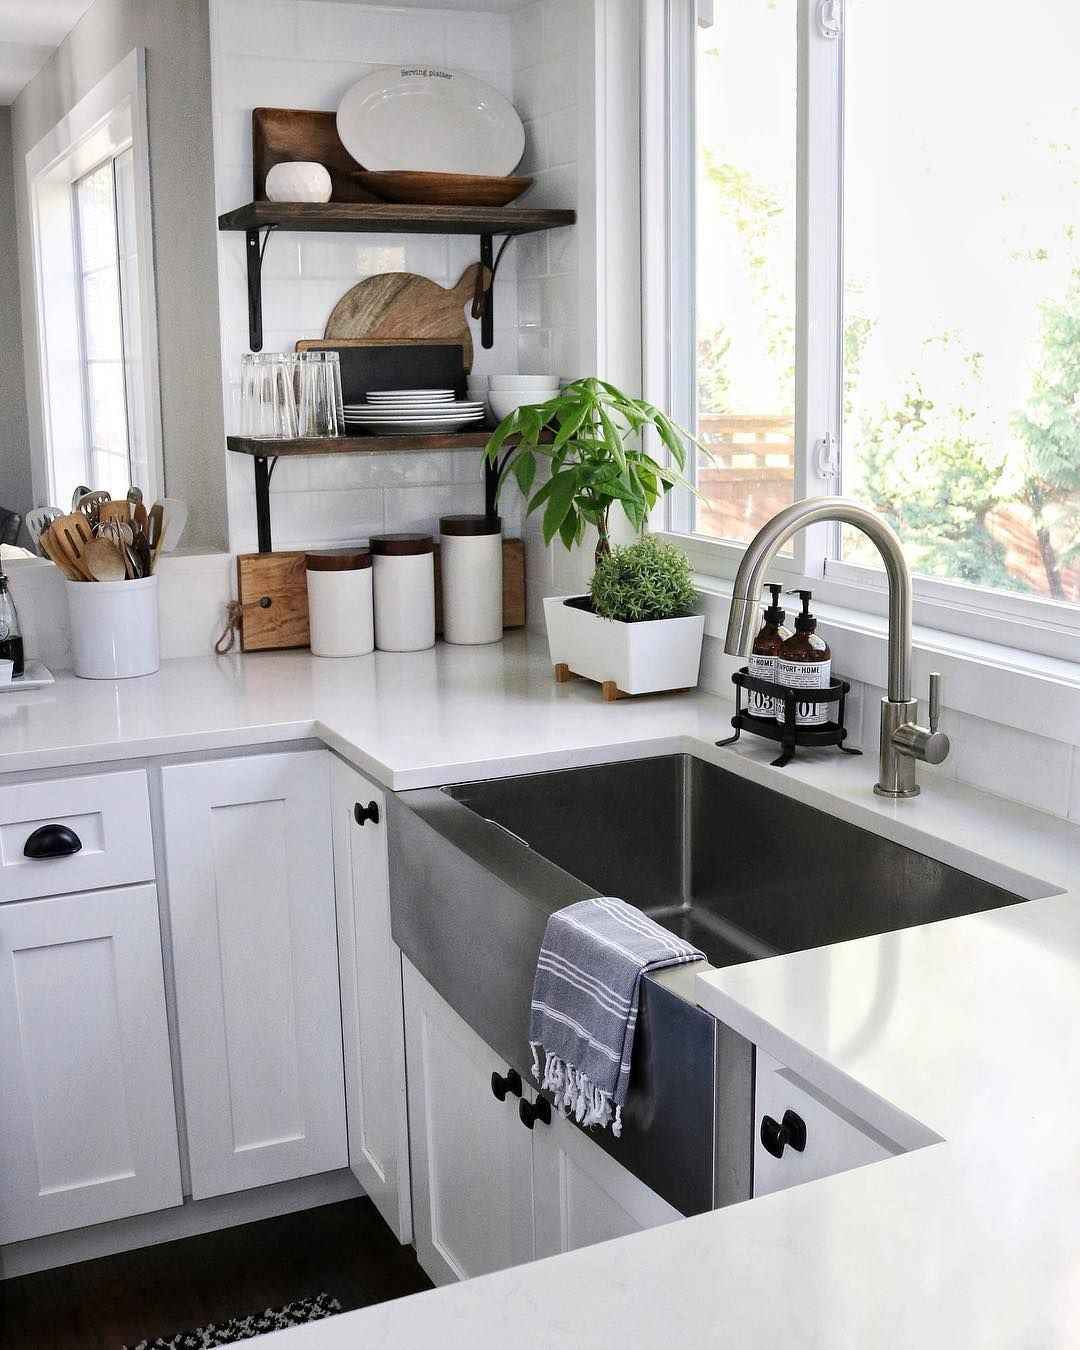 Pin de Evelina Hernandez en muebles de cocina | Pinterest | Cocinas ...